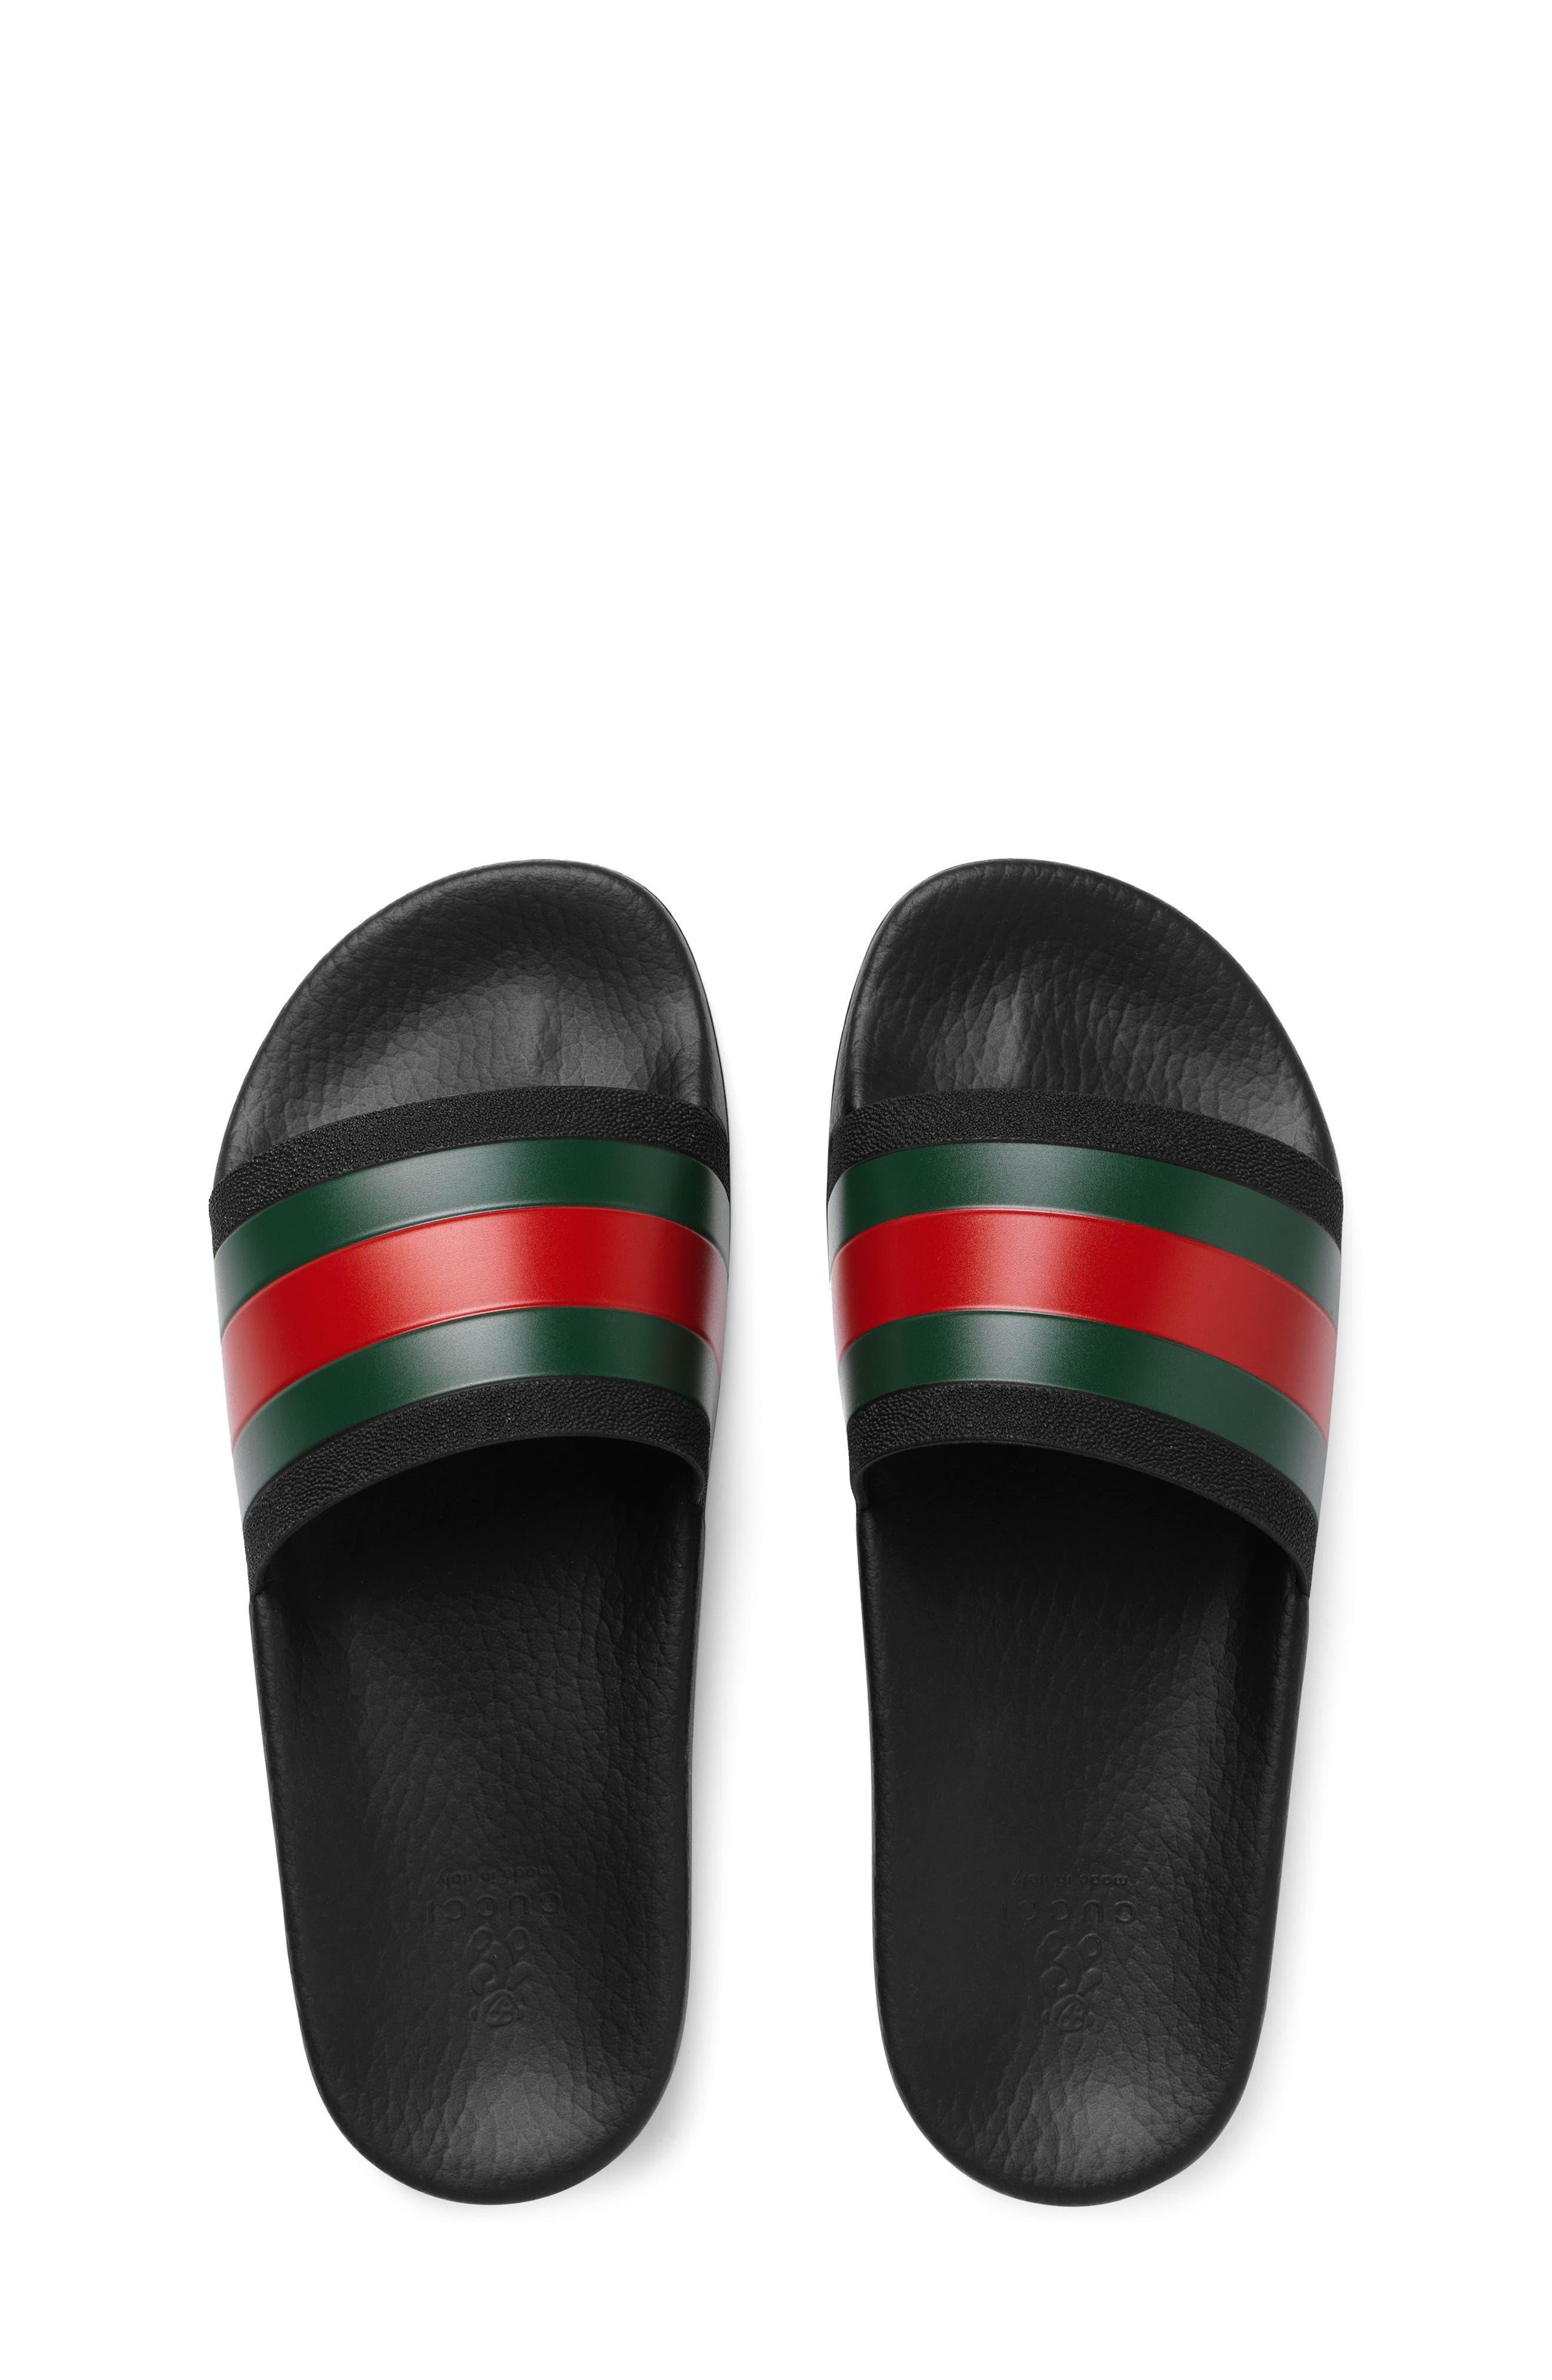 GUCCI, Pursuit Slide Sandal, Alternate thumbnail 5, color, BLACK/ GREEN/ RED